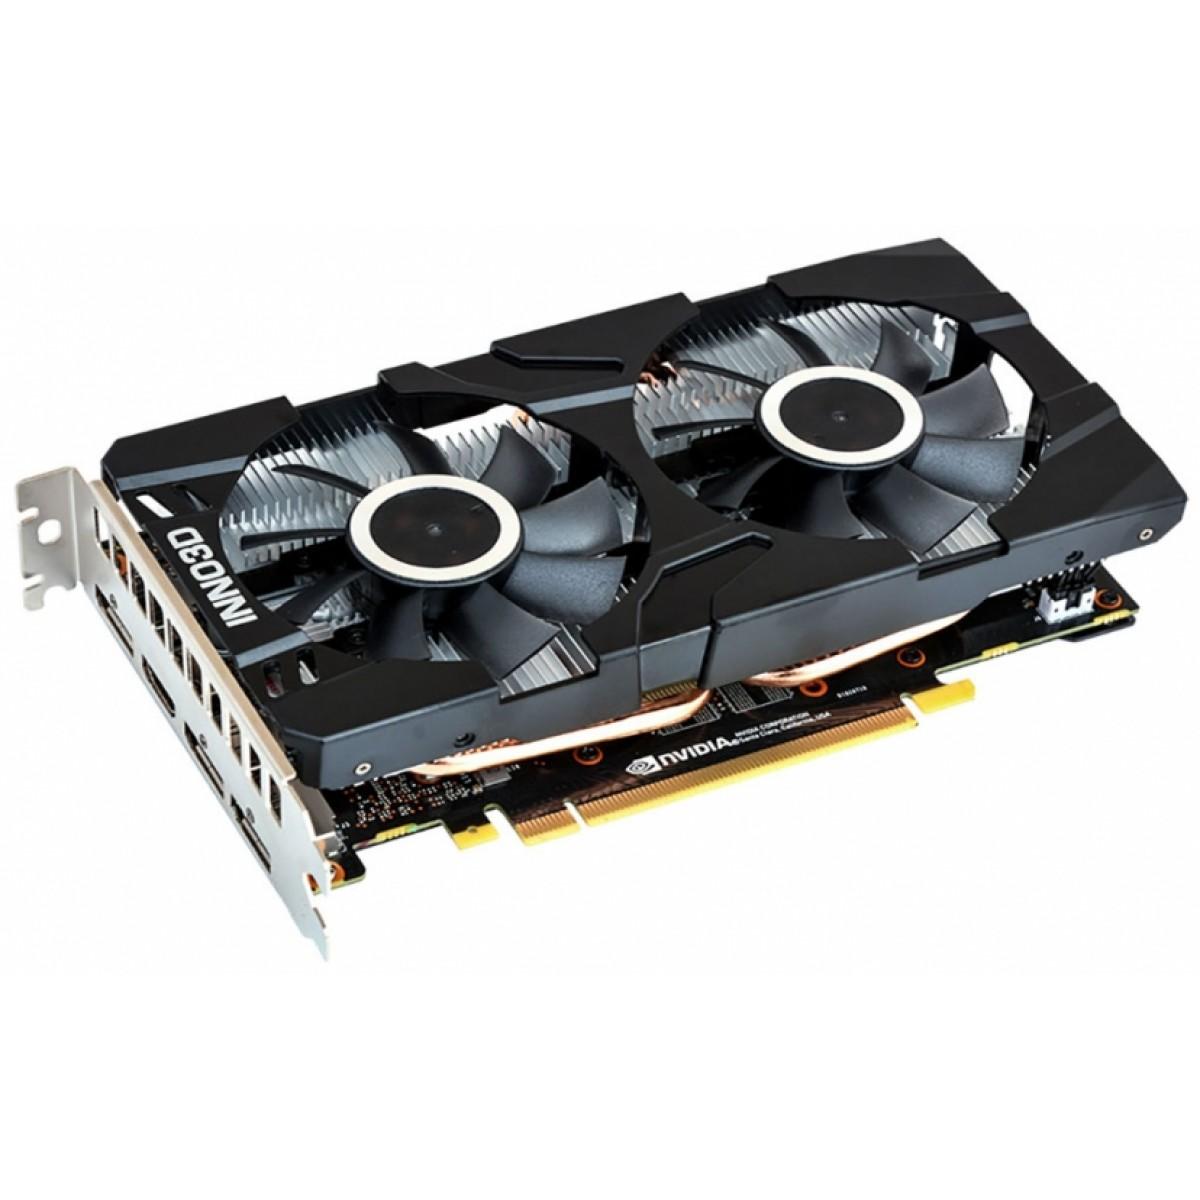 Placa de Vídeo Inno3D GeForce GTX 1660 Ti Twin X2, 6GB GDDR6, 192Bit, N166T2-06D6-1710VA15